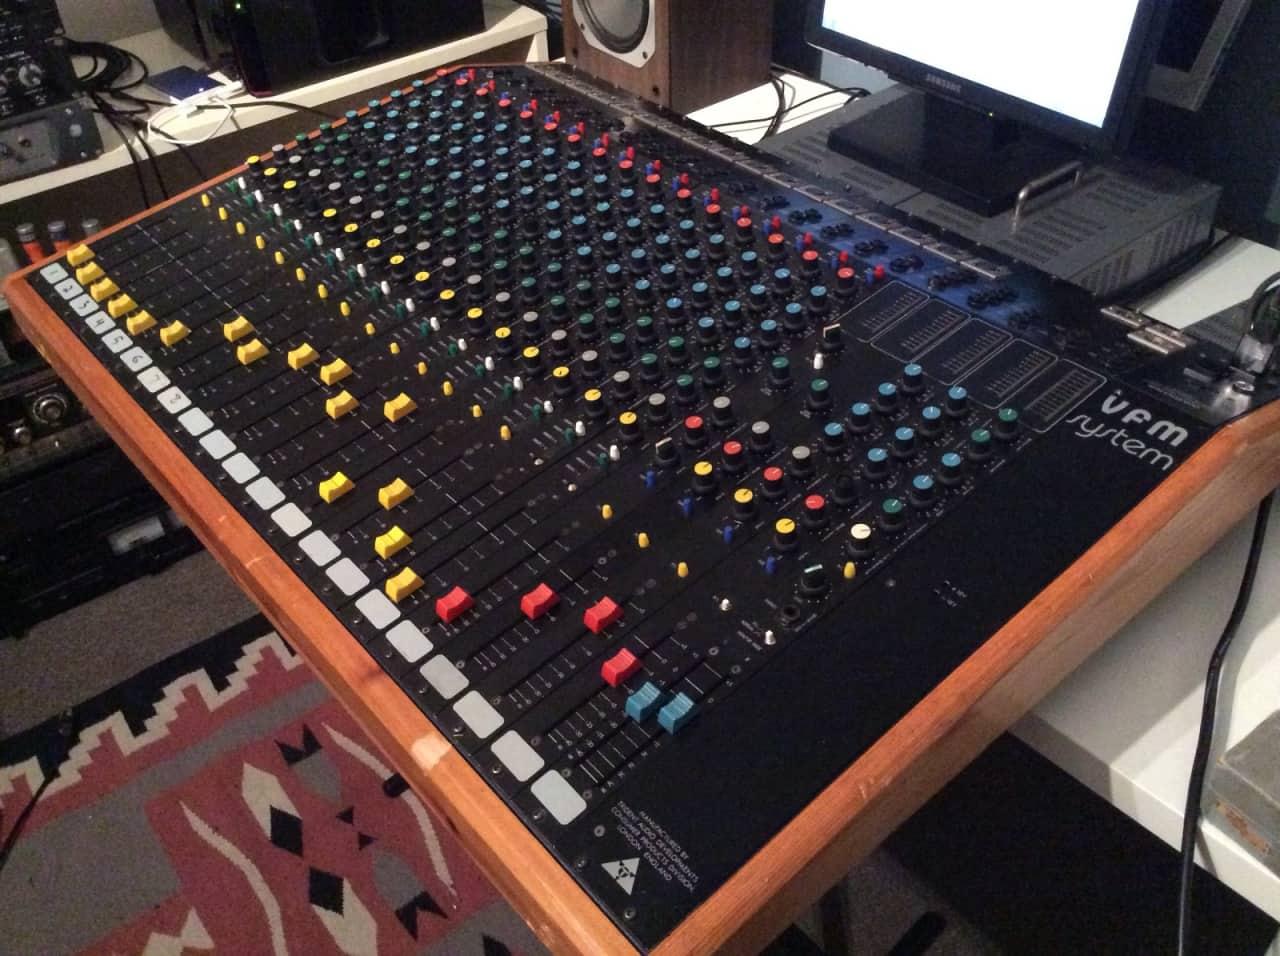 Recording Consoles For Sale : vintage recording consoles holland teenpornclips ~ Russianpoet.info Haus und Dekorationen